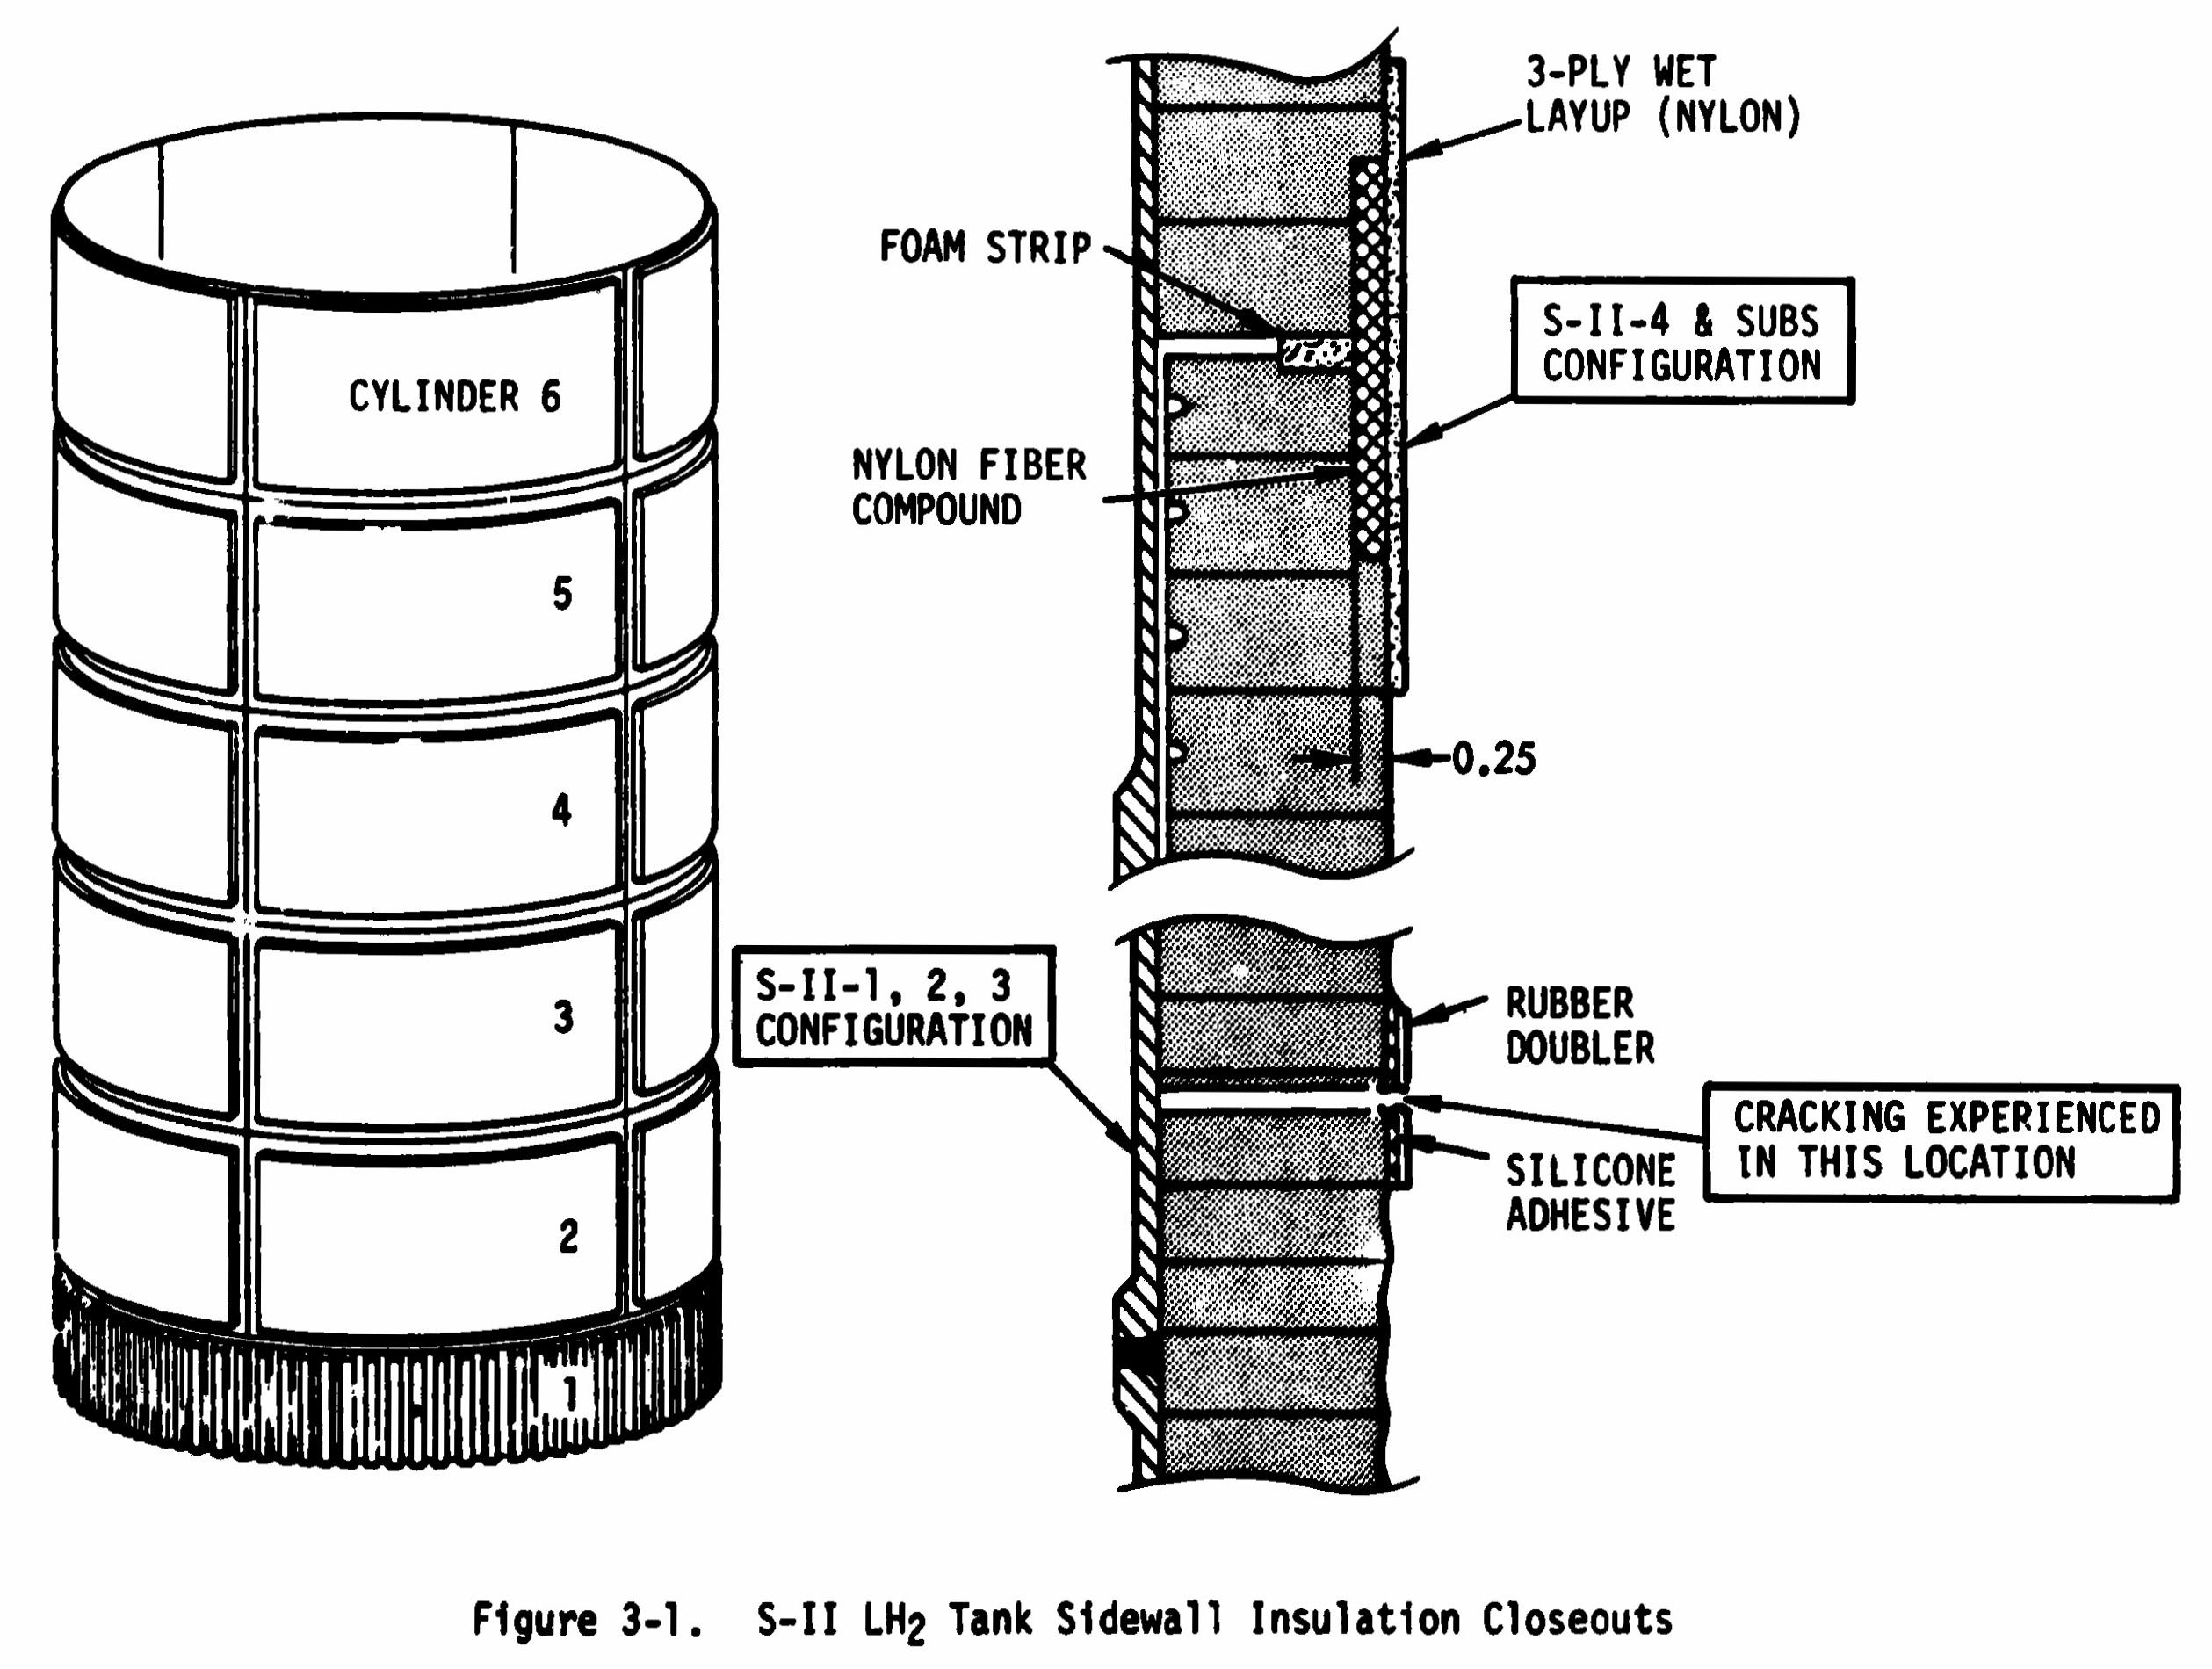 Deutz Engine Parts besides Ge 7fa Gas Turbine Diagram in addition Hippomobile further F 1 LOX GAS And J 2 LOX LH2 Rocket Engines 693454225 further Stanadyne Fuel Pump Diagram Wiring Diagrams. on hydrogen engine